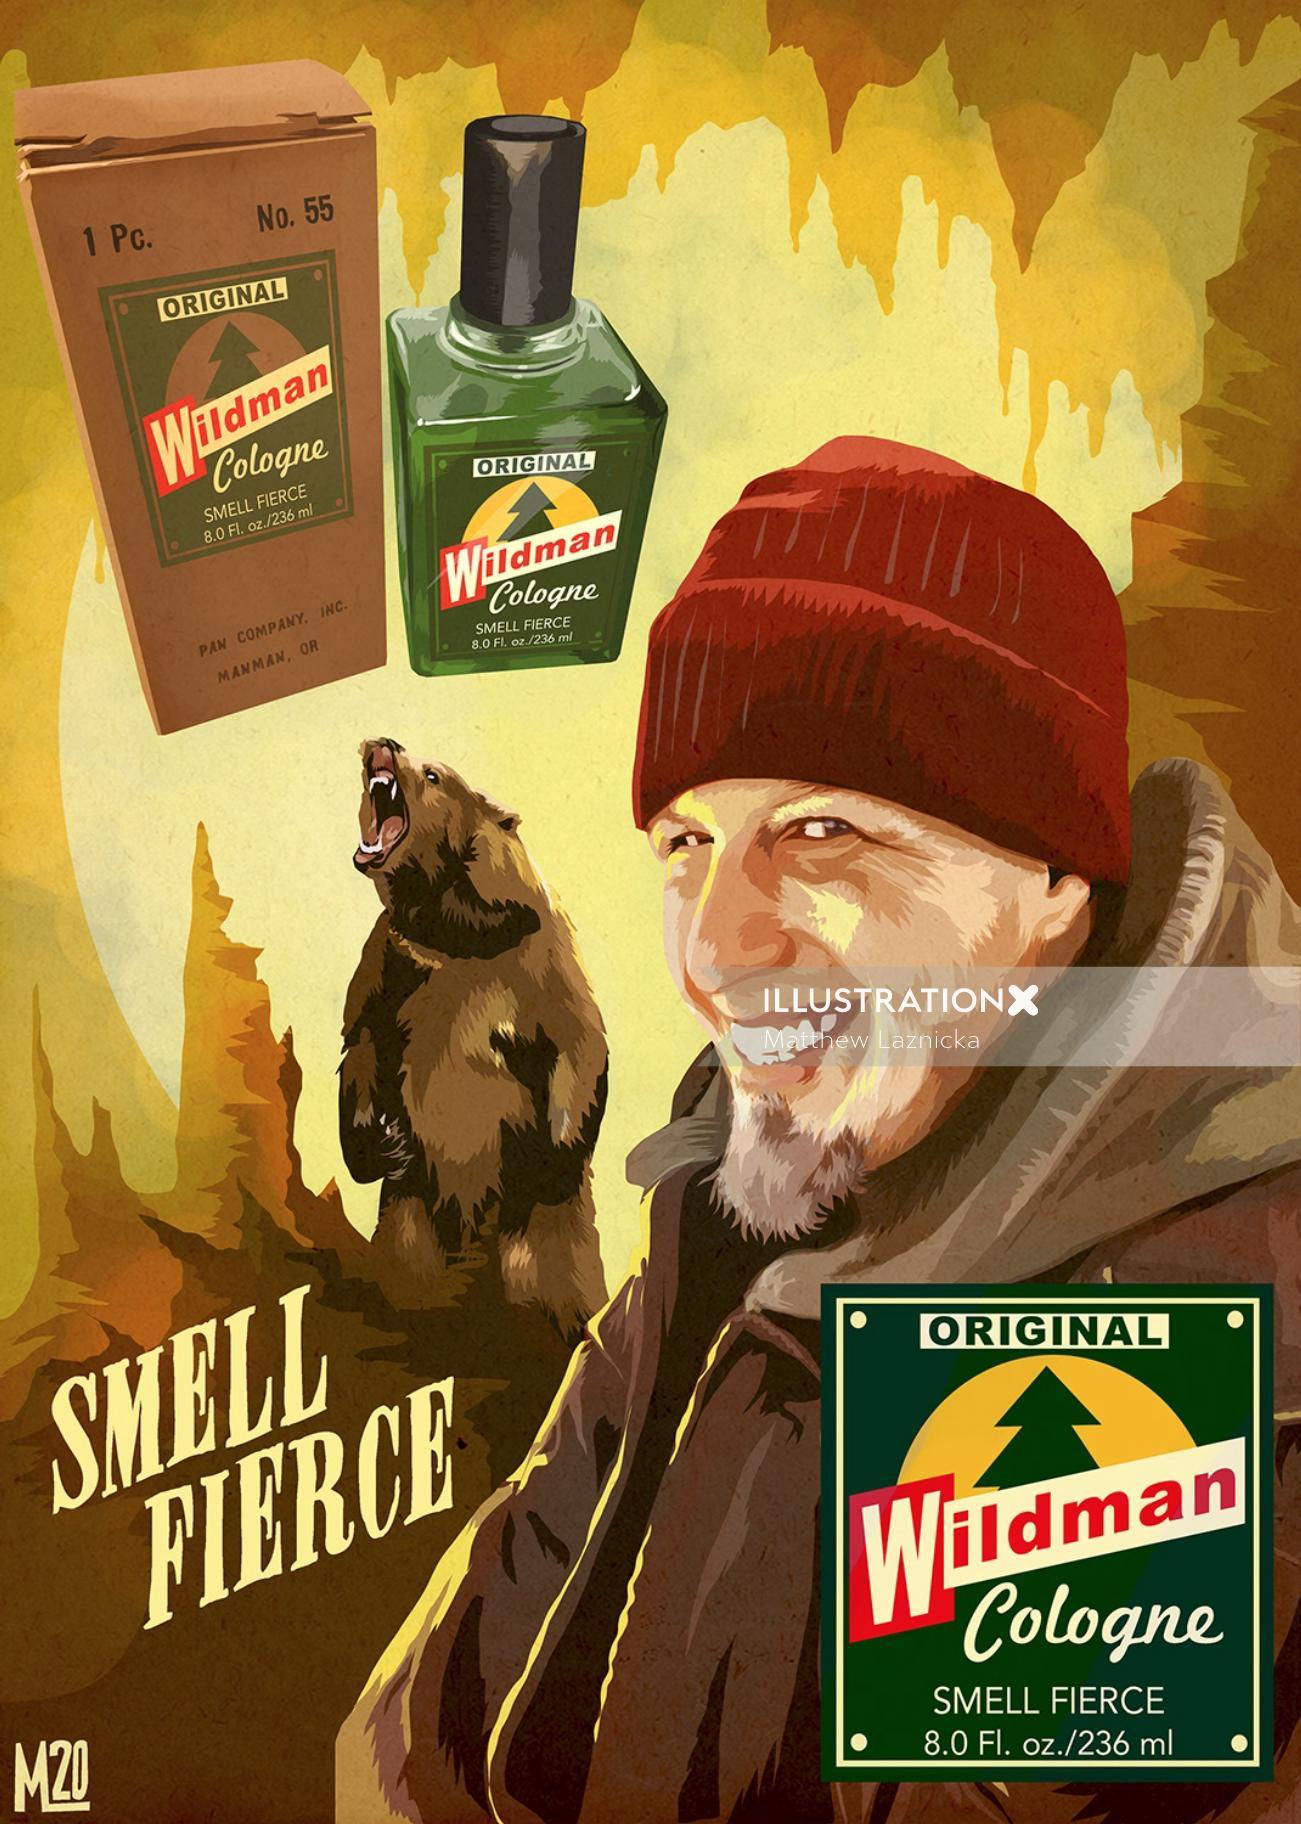 Wildman Cologne Advertising